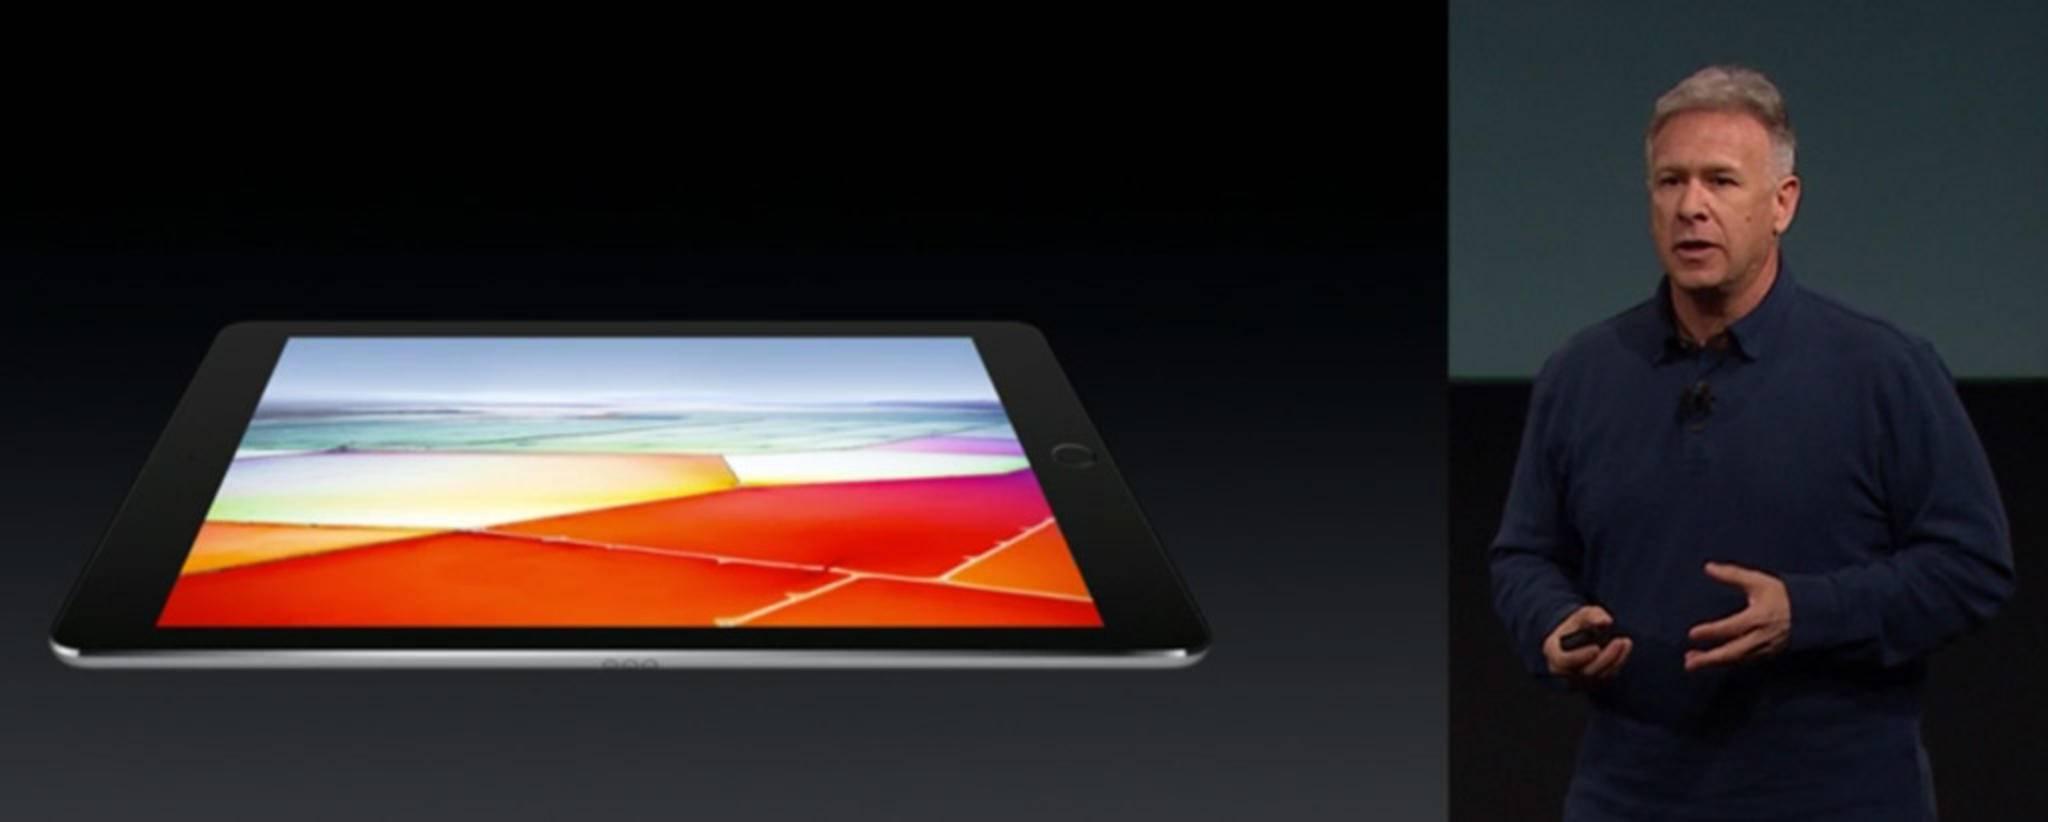 Keynote-iPad-Pro-Display